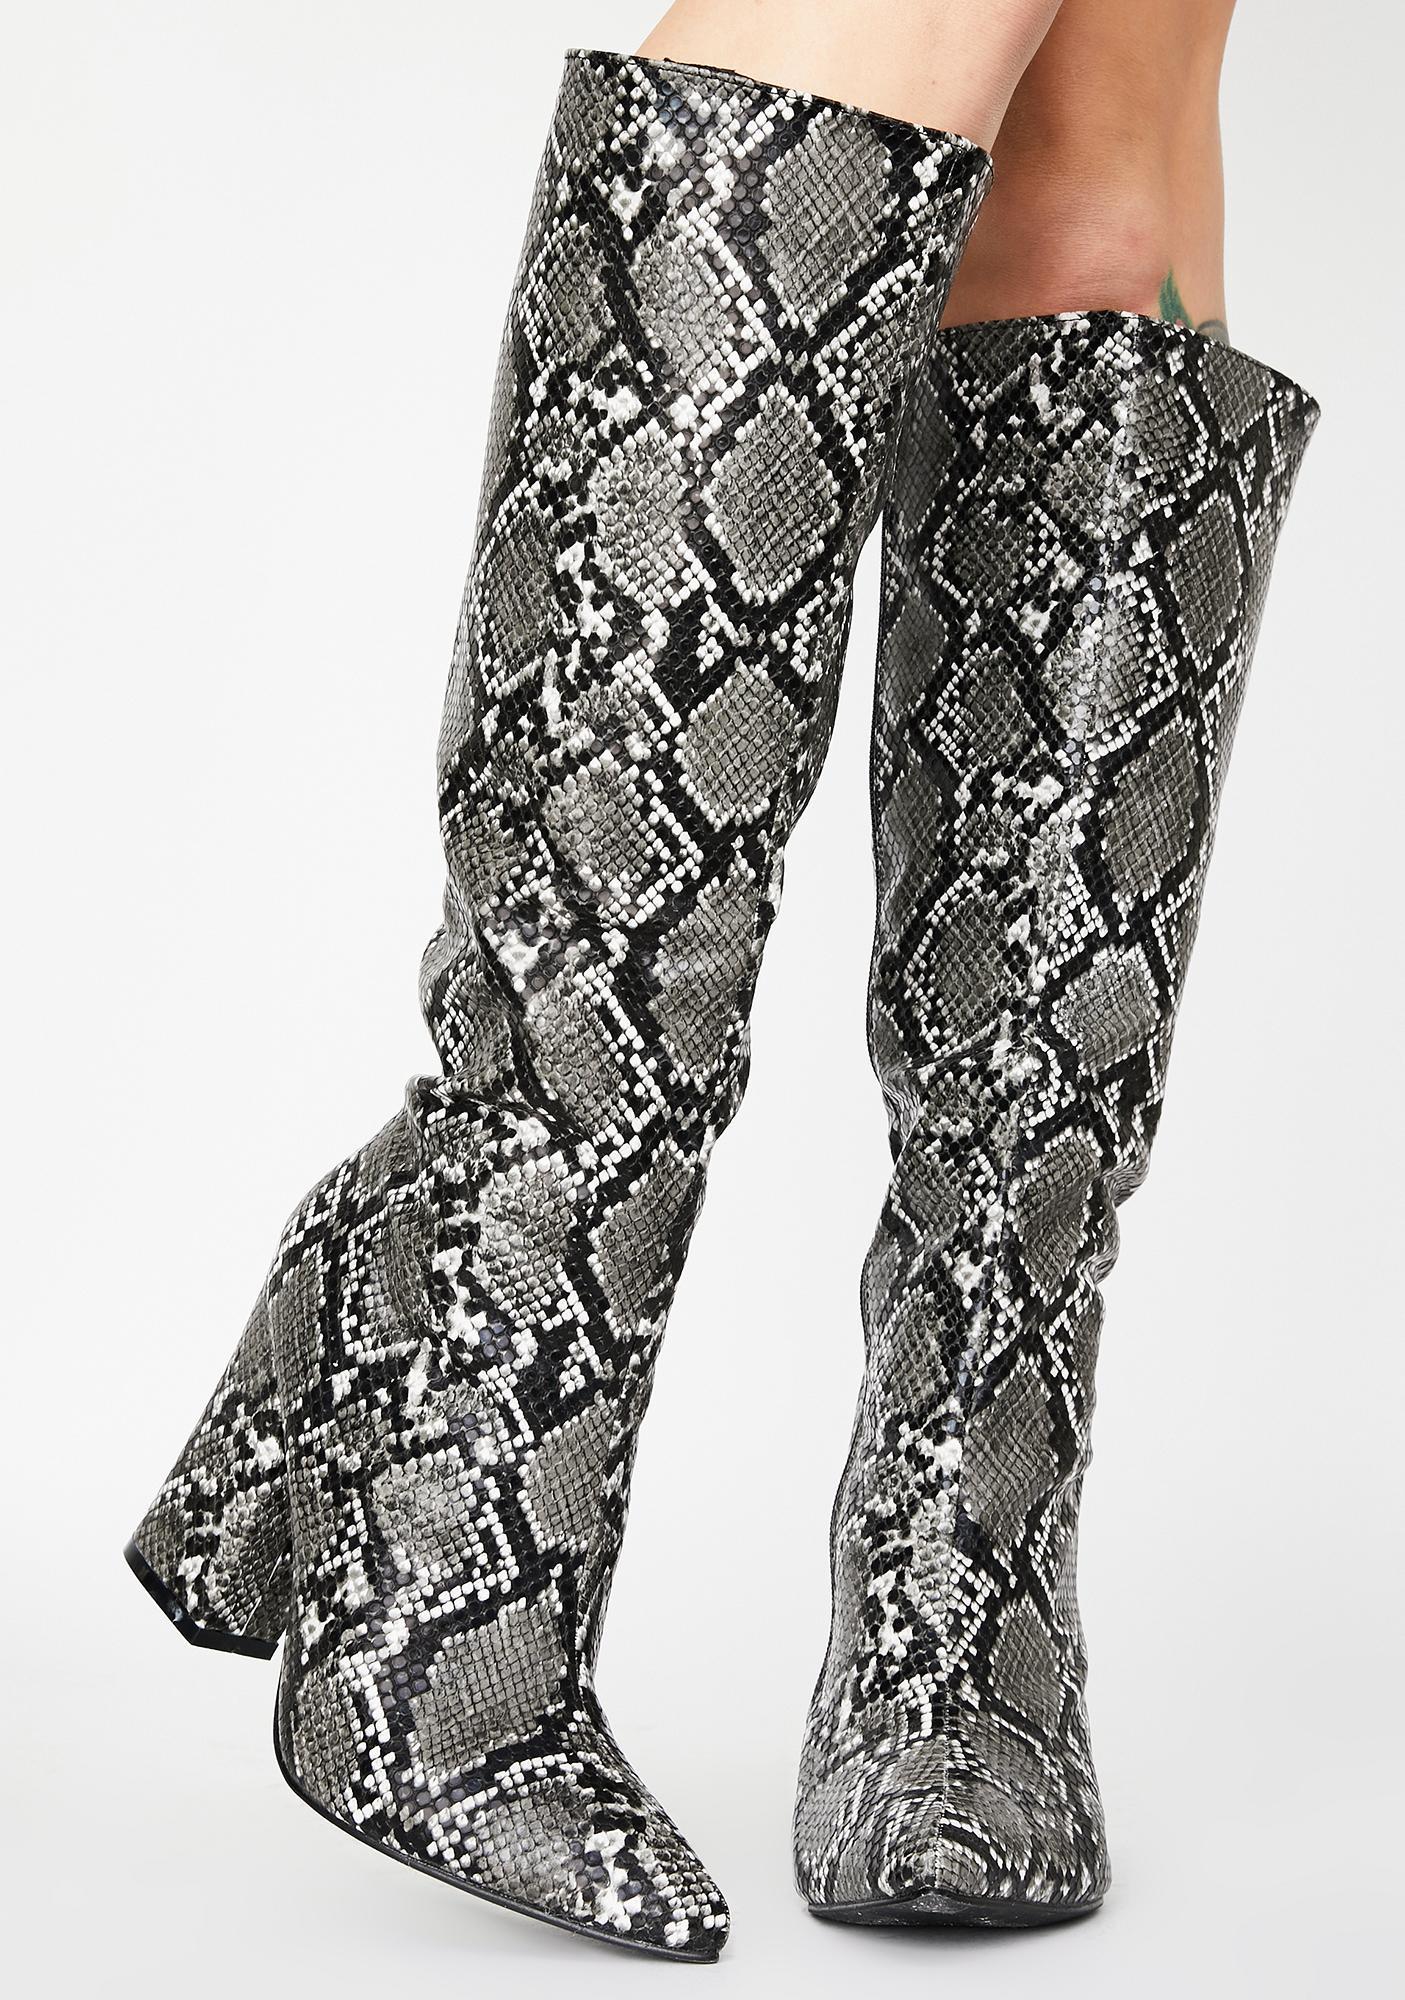 Smokey Cobra Couture Knee High Boots